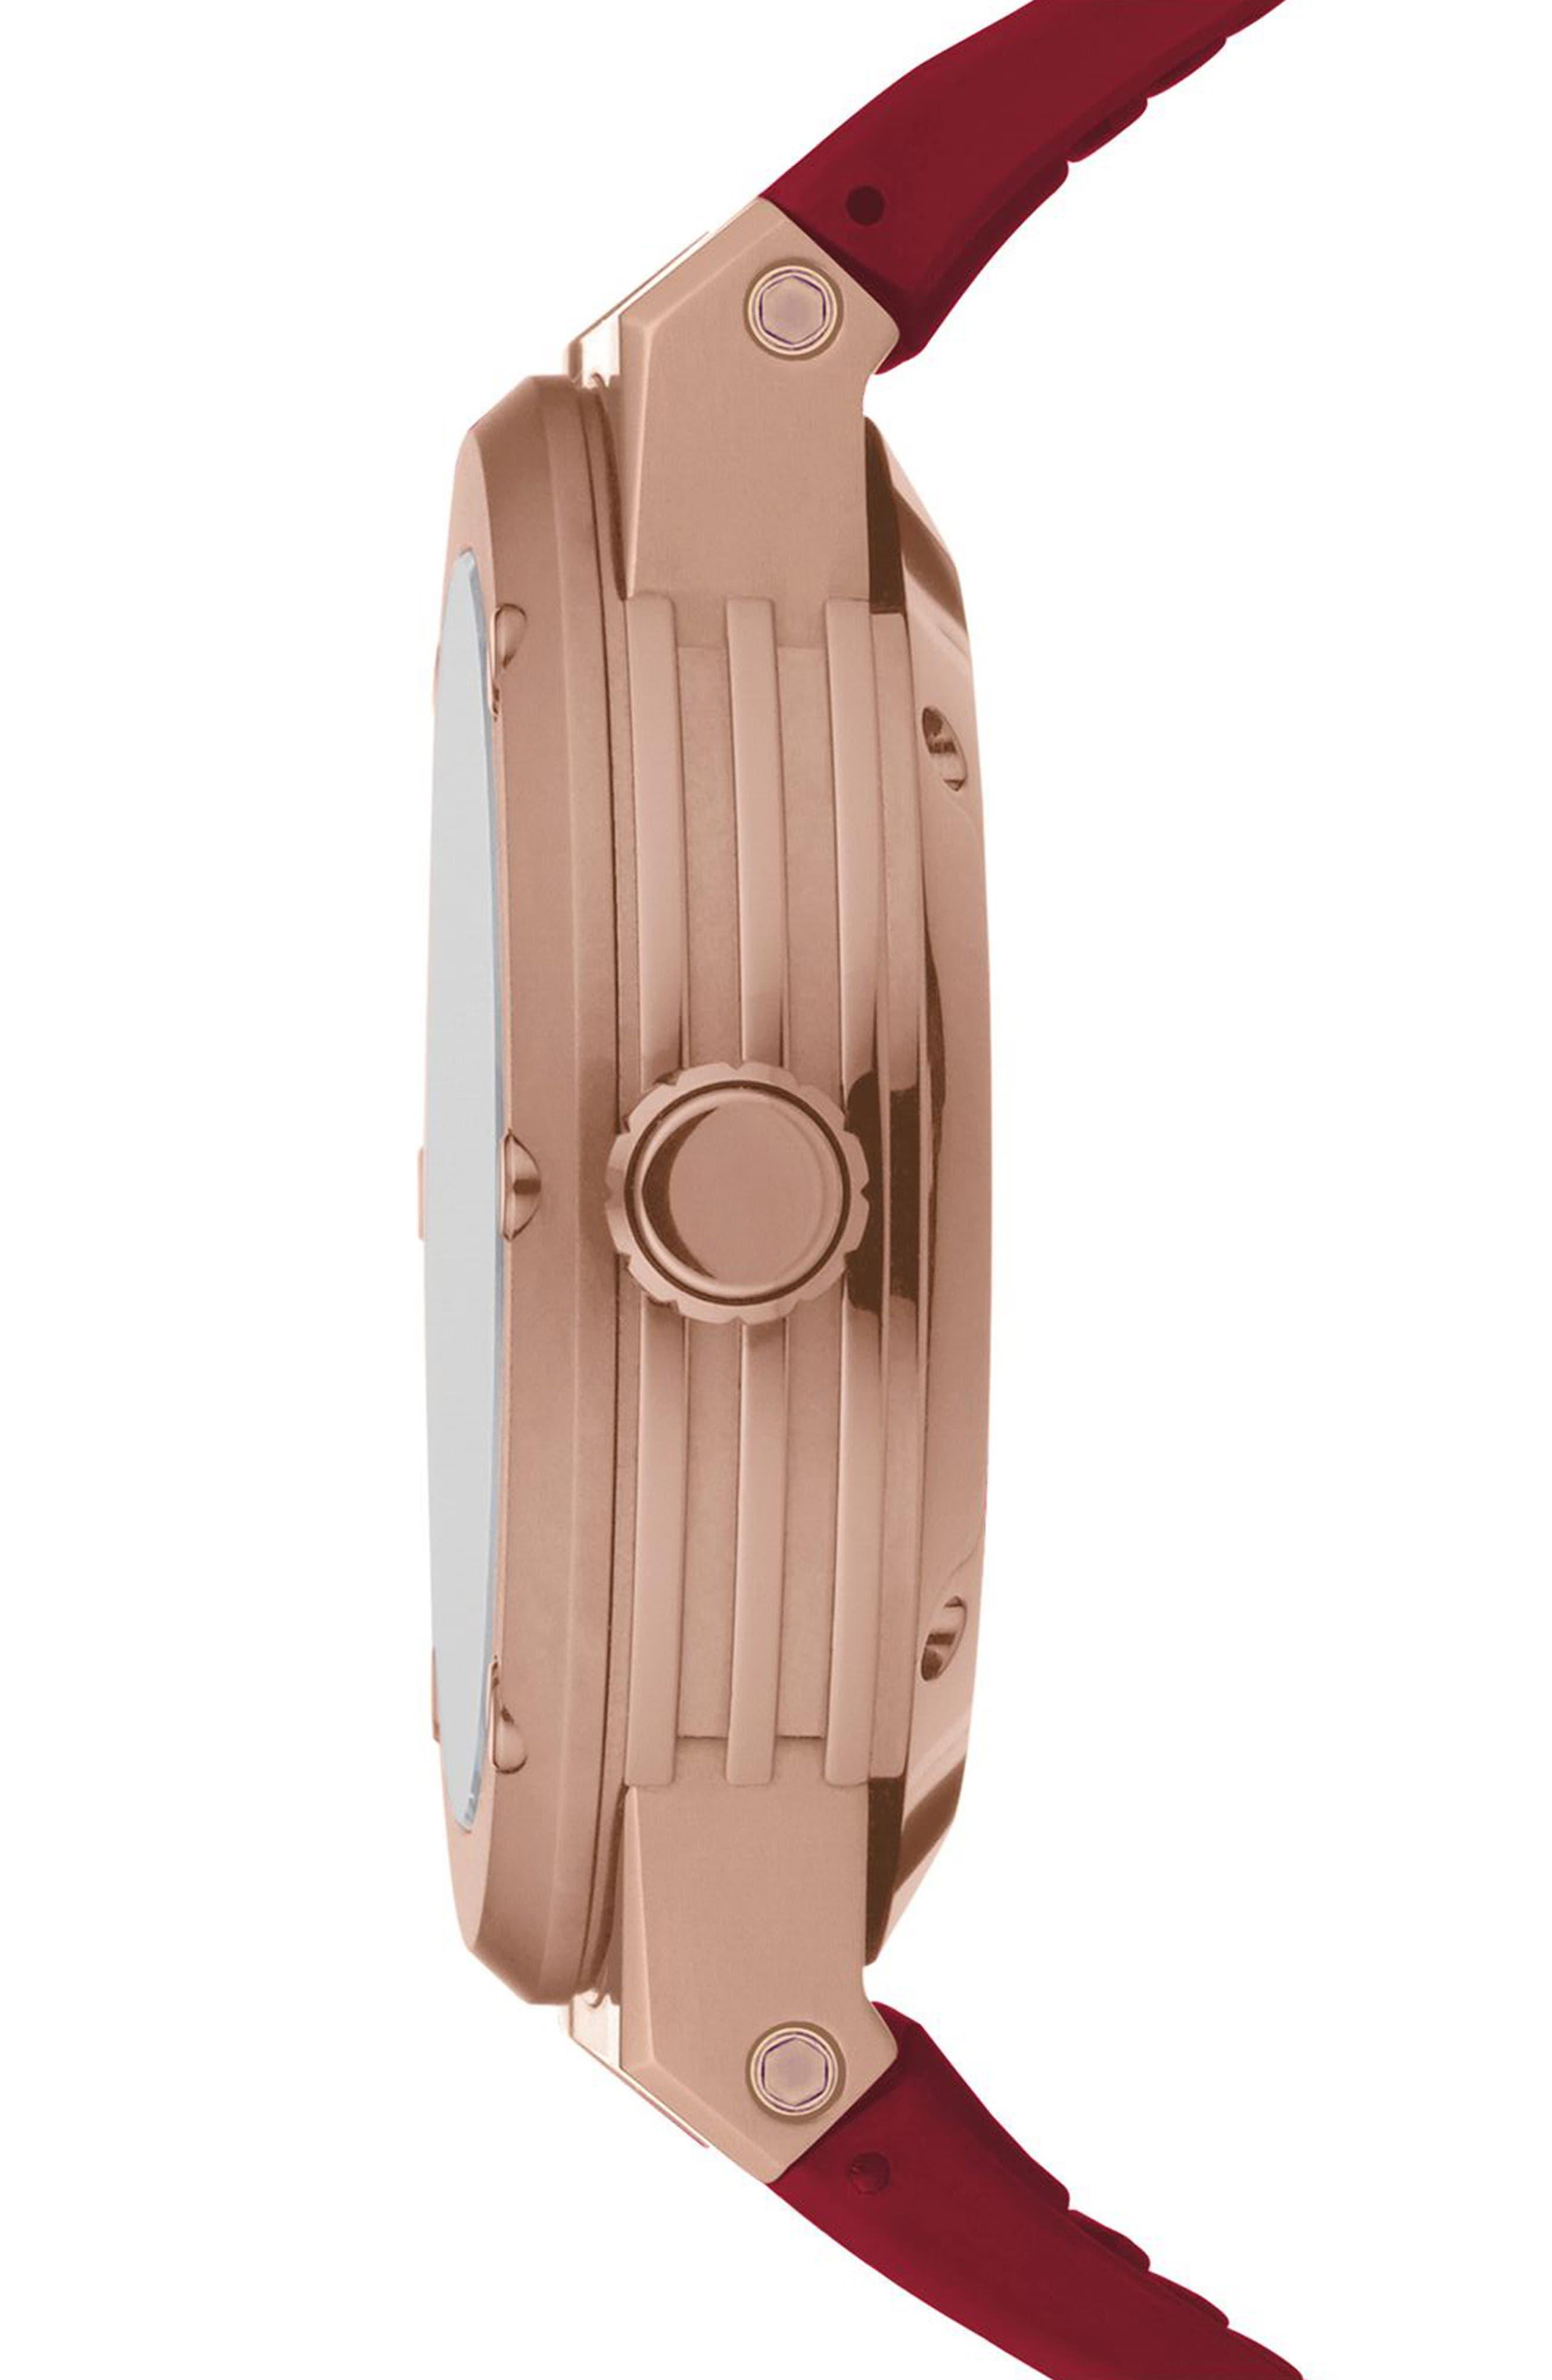 SALVATORE FERRAGAMO, F-80 Motion Rubber Strap Smart Watch, 44mm, Alternate thumbnail 2, color, BURGUNDY/ WHITE MOP/ ROSE GOLD